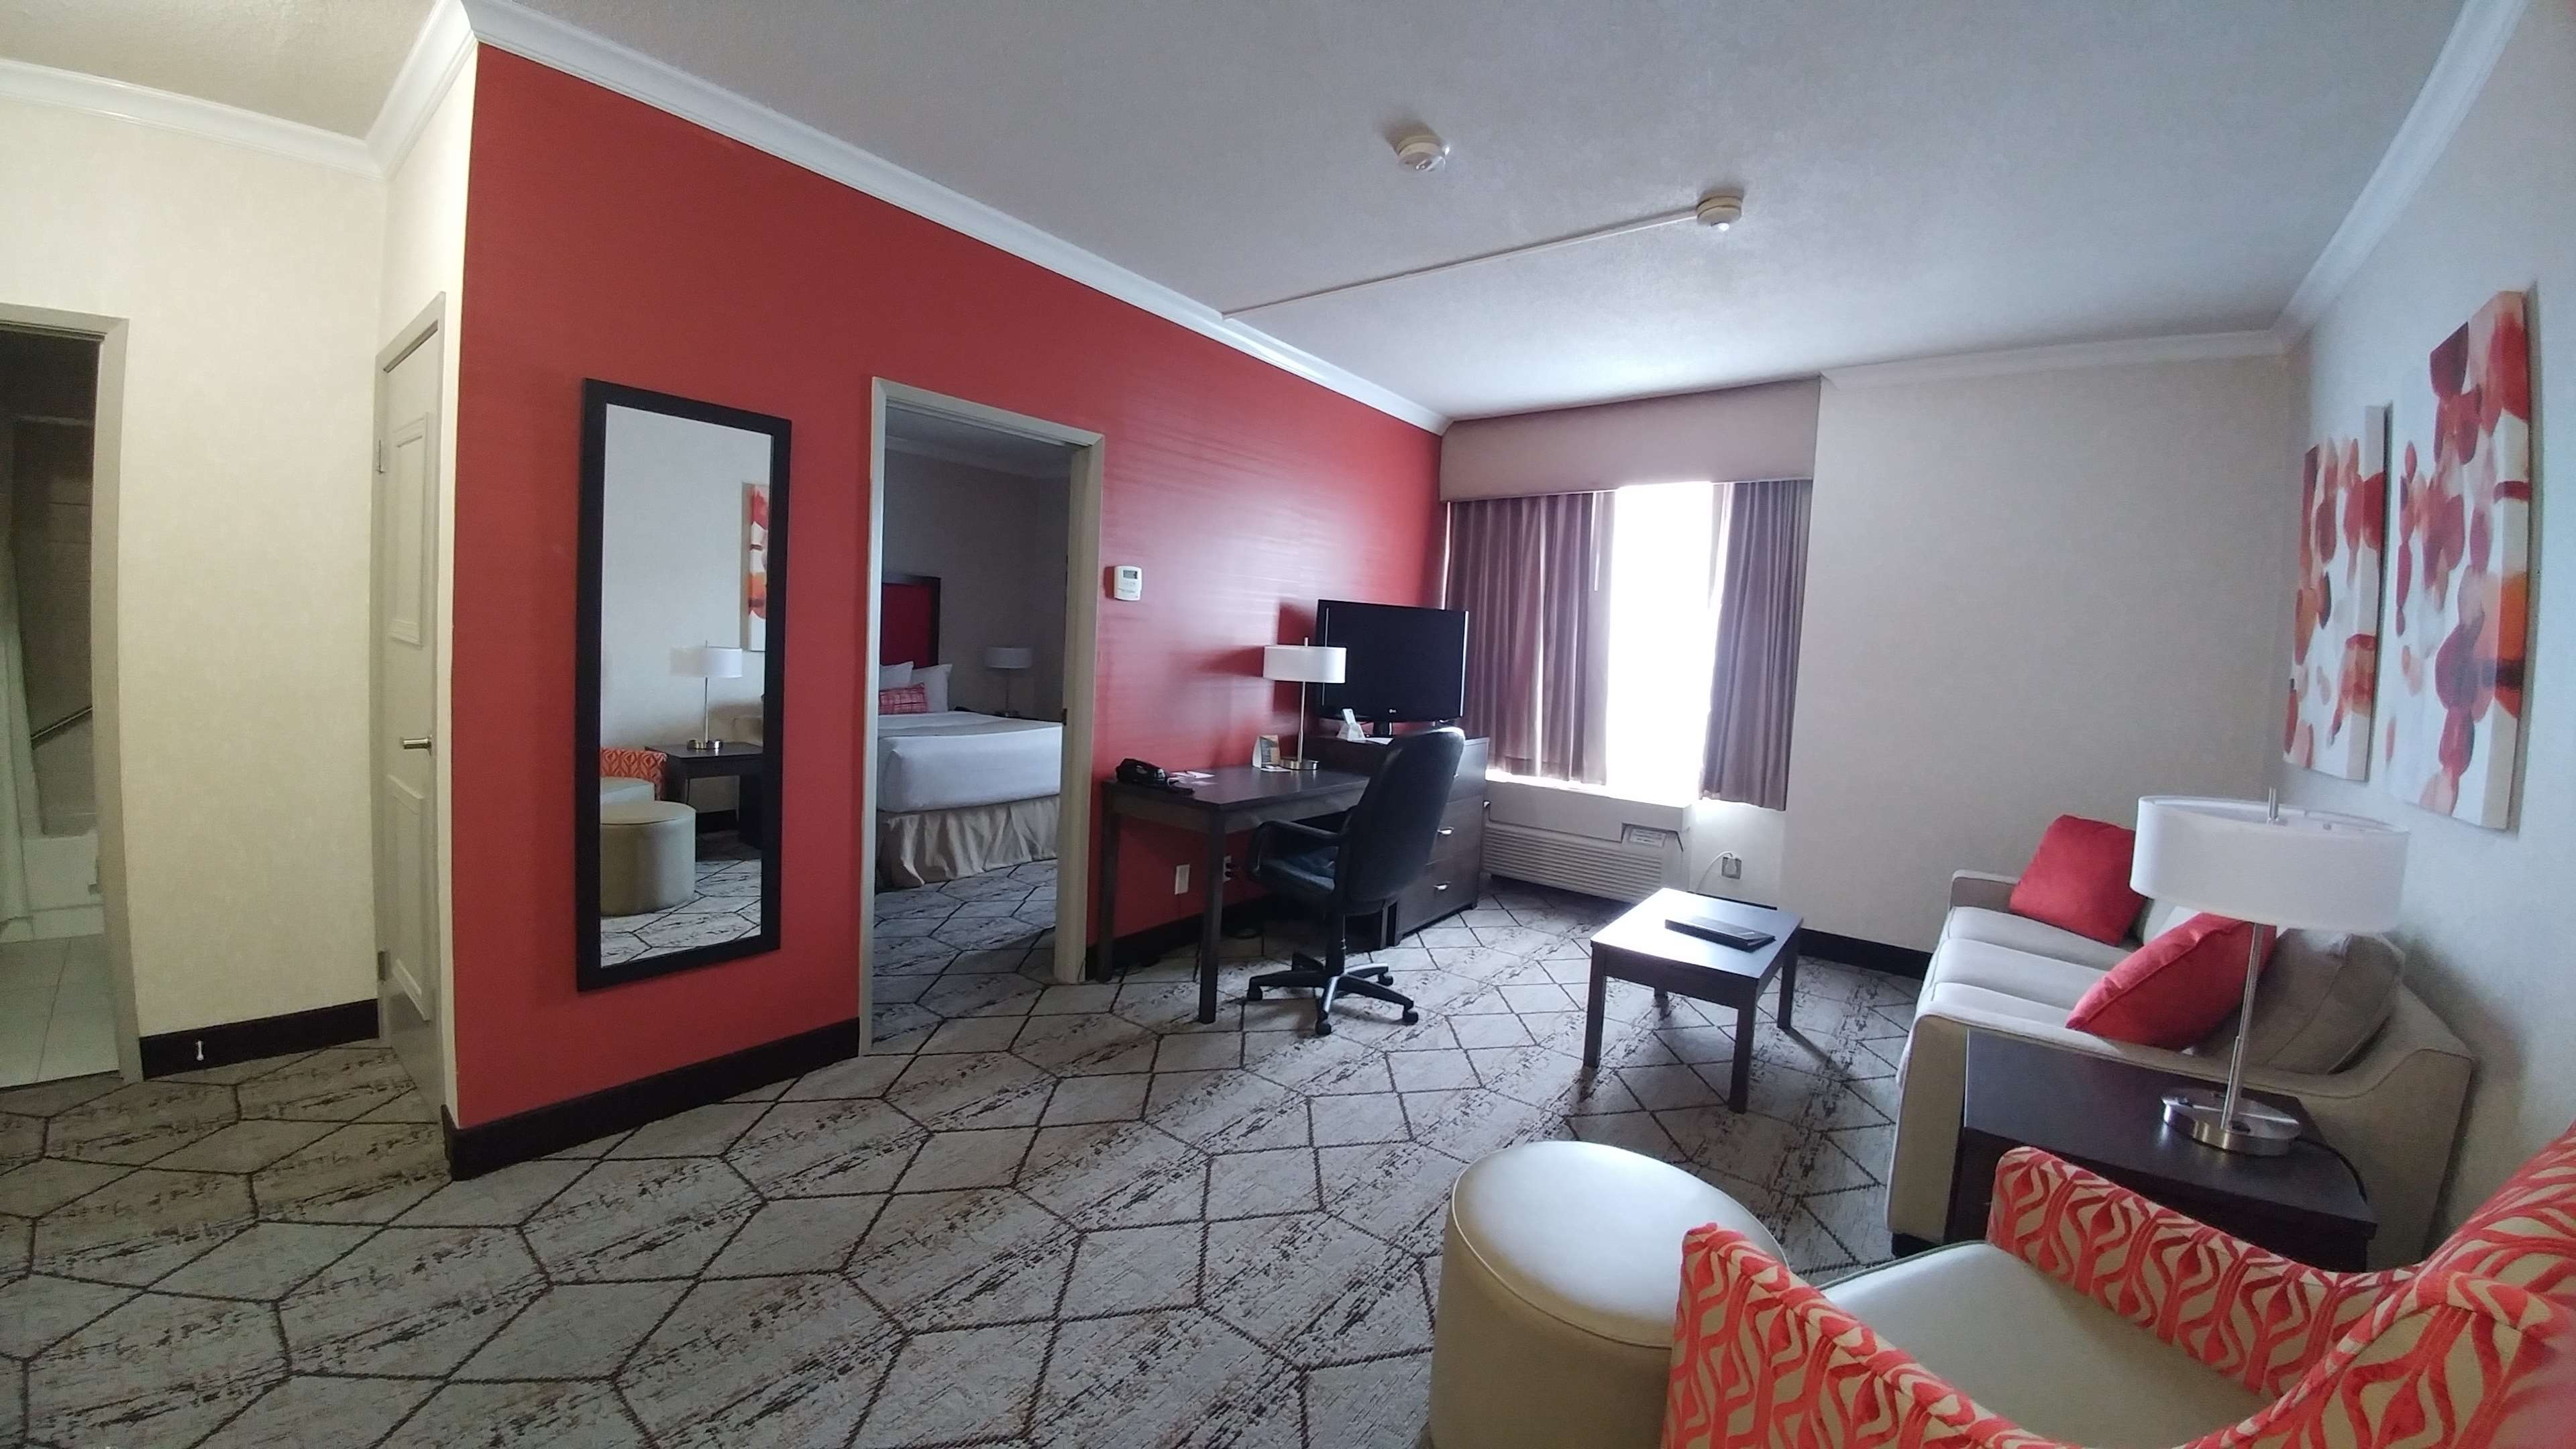 Best Western Plus Rose City Suites in Welland: Living Room area of guest suite